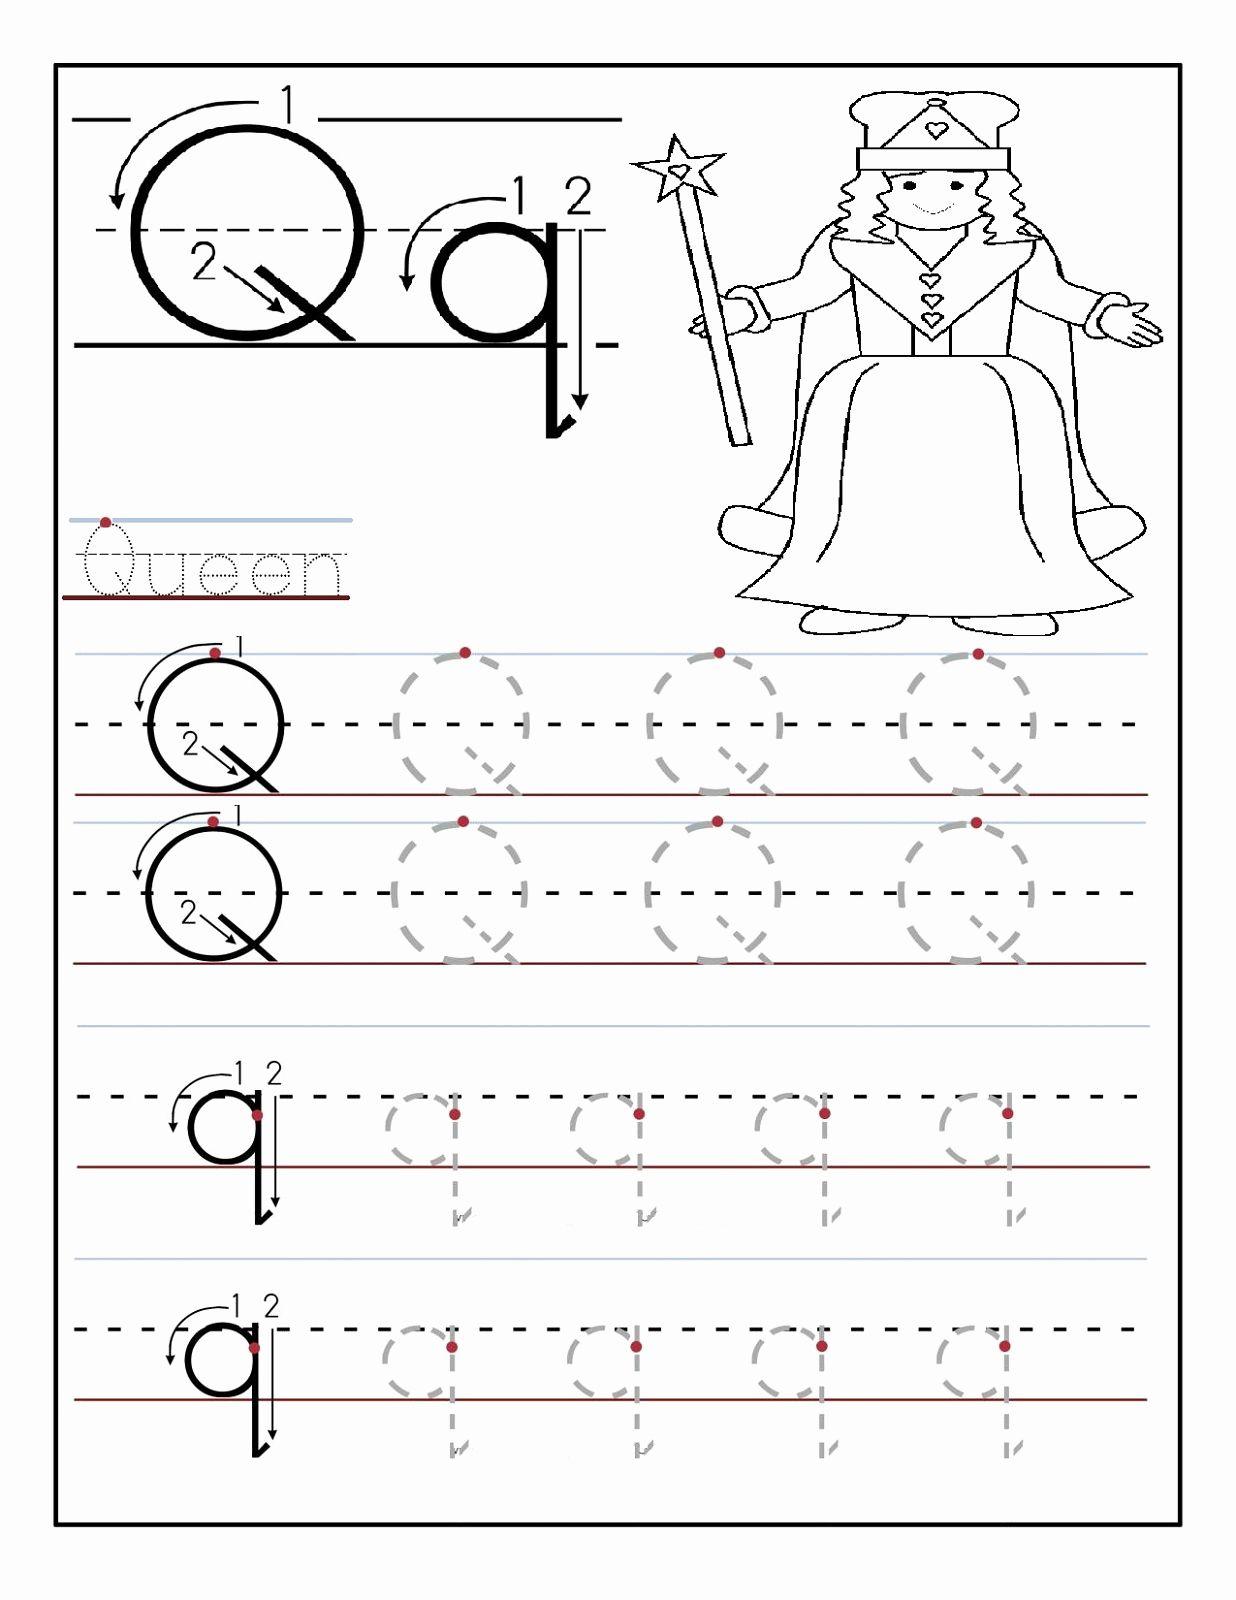 Alphabets Worksheets For Preschoolers In